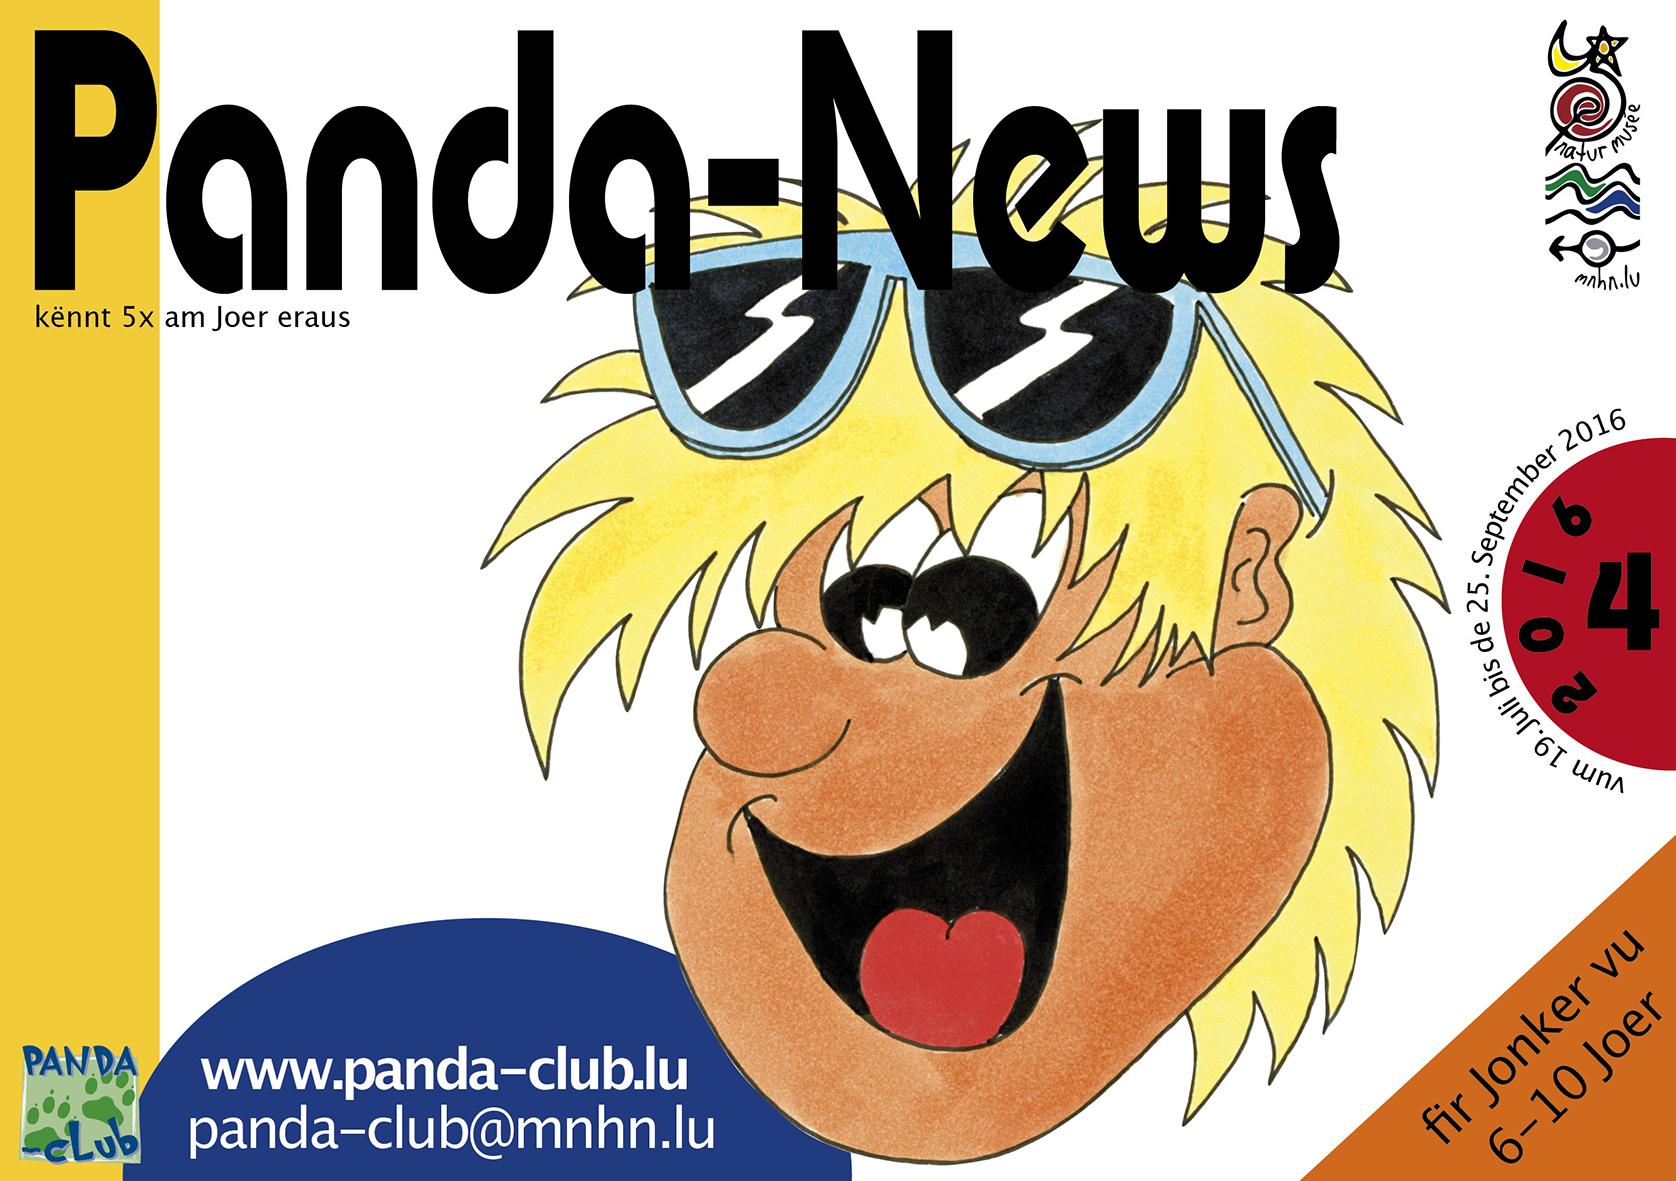 20164CoverPandaNews